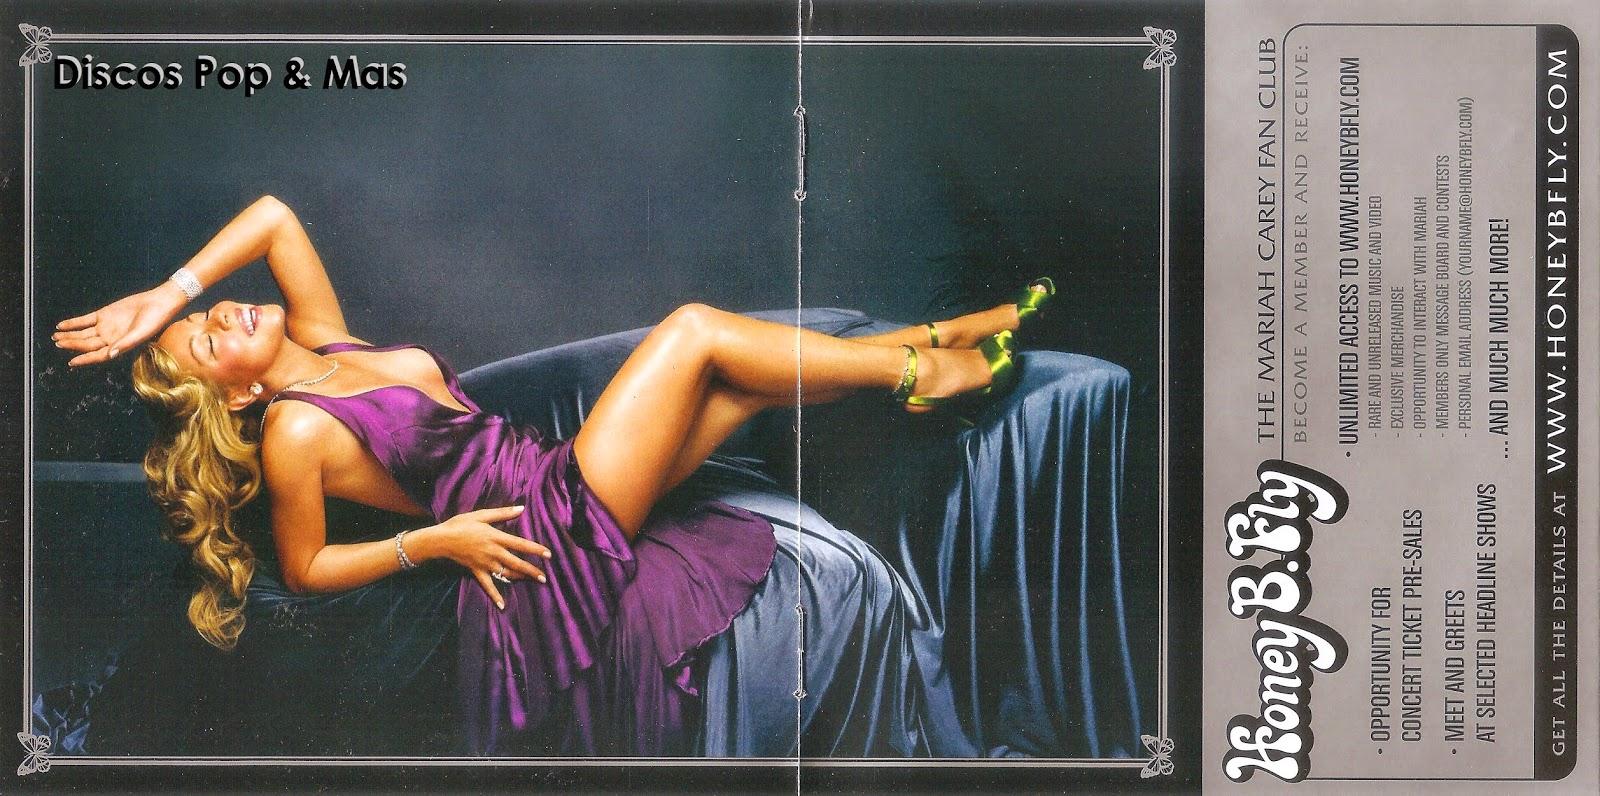 Discos Pop & Mas: Mariah Carey - The Emancipation of Mimi ...